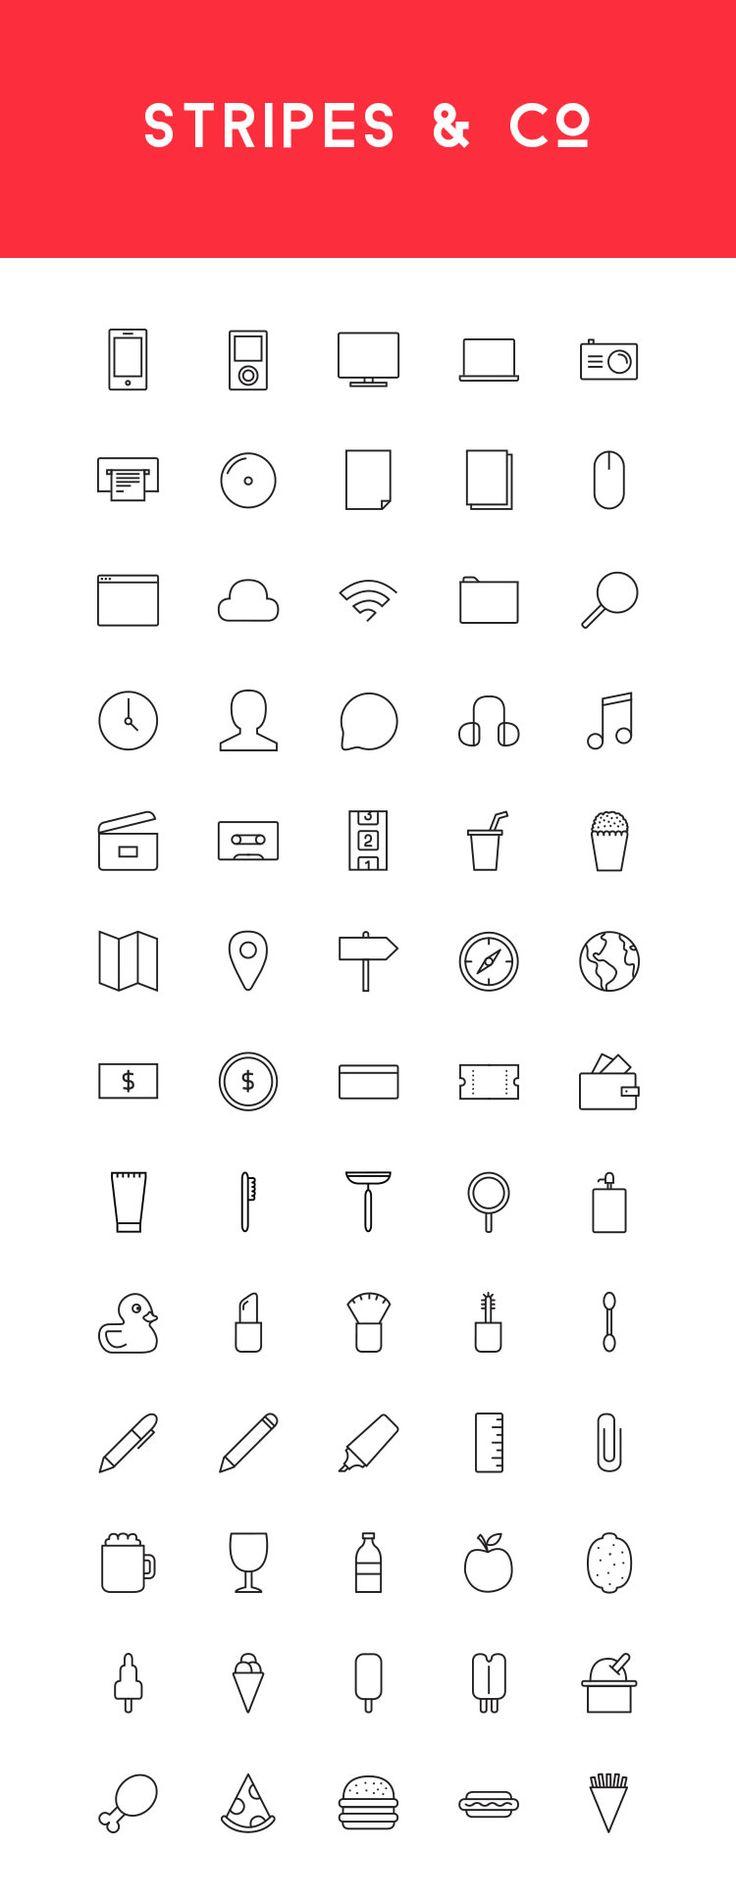 Freebie: Stripes & Co - A Line-Styled Icon Set (65 Icons) - Speckyboy Design Magazine